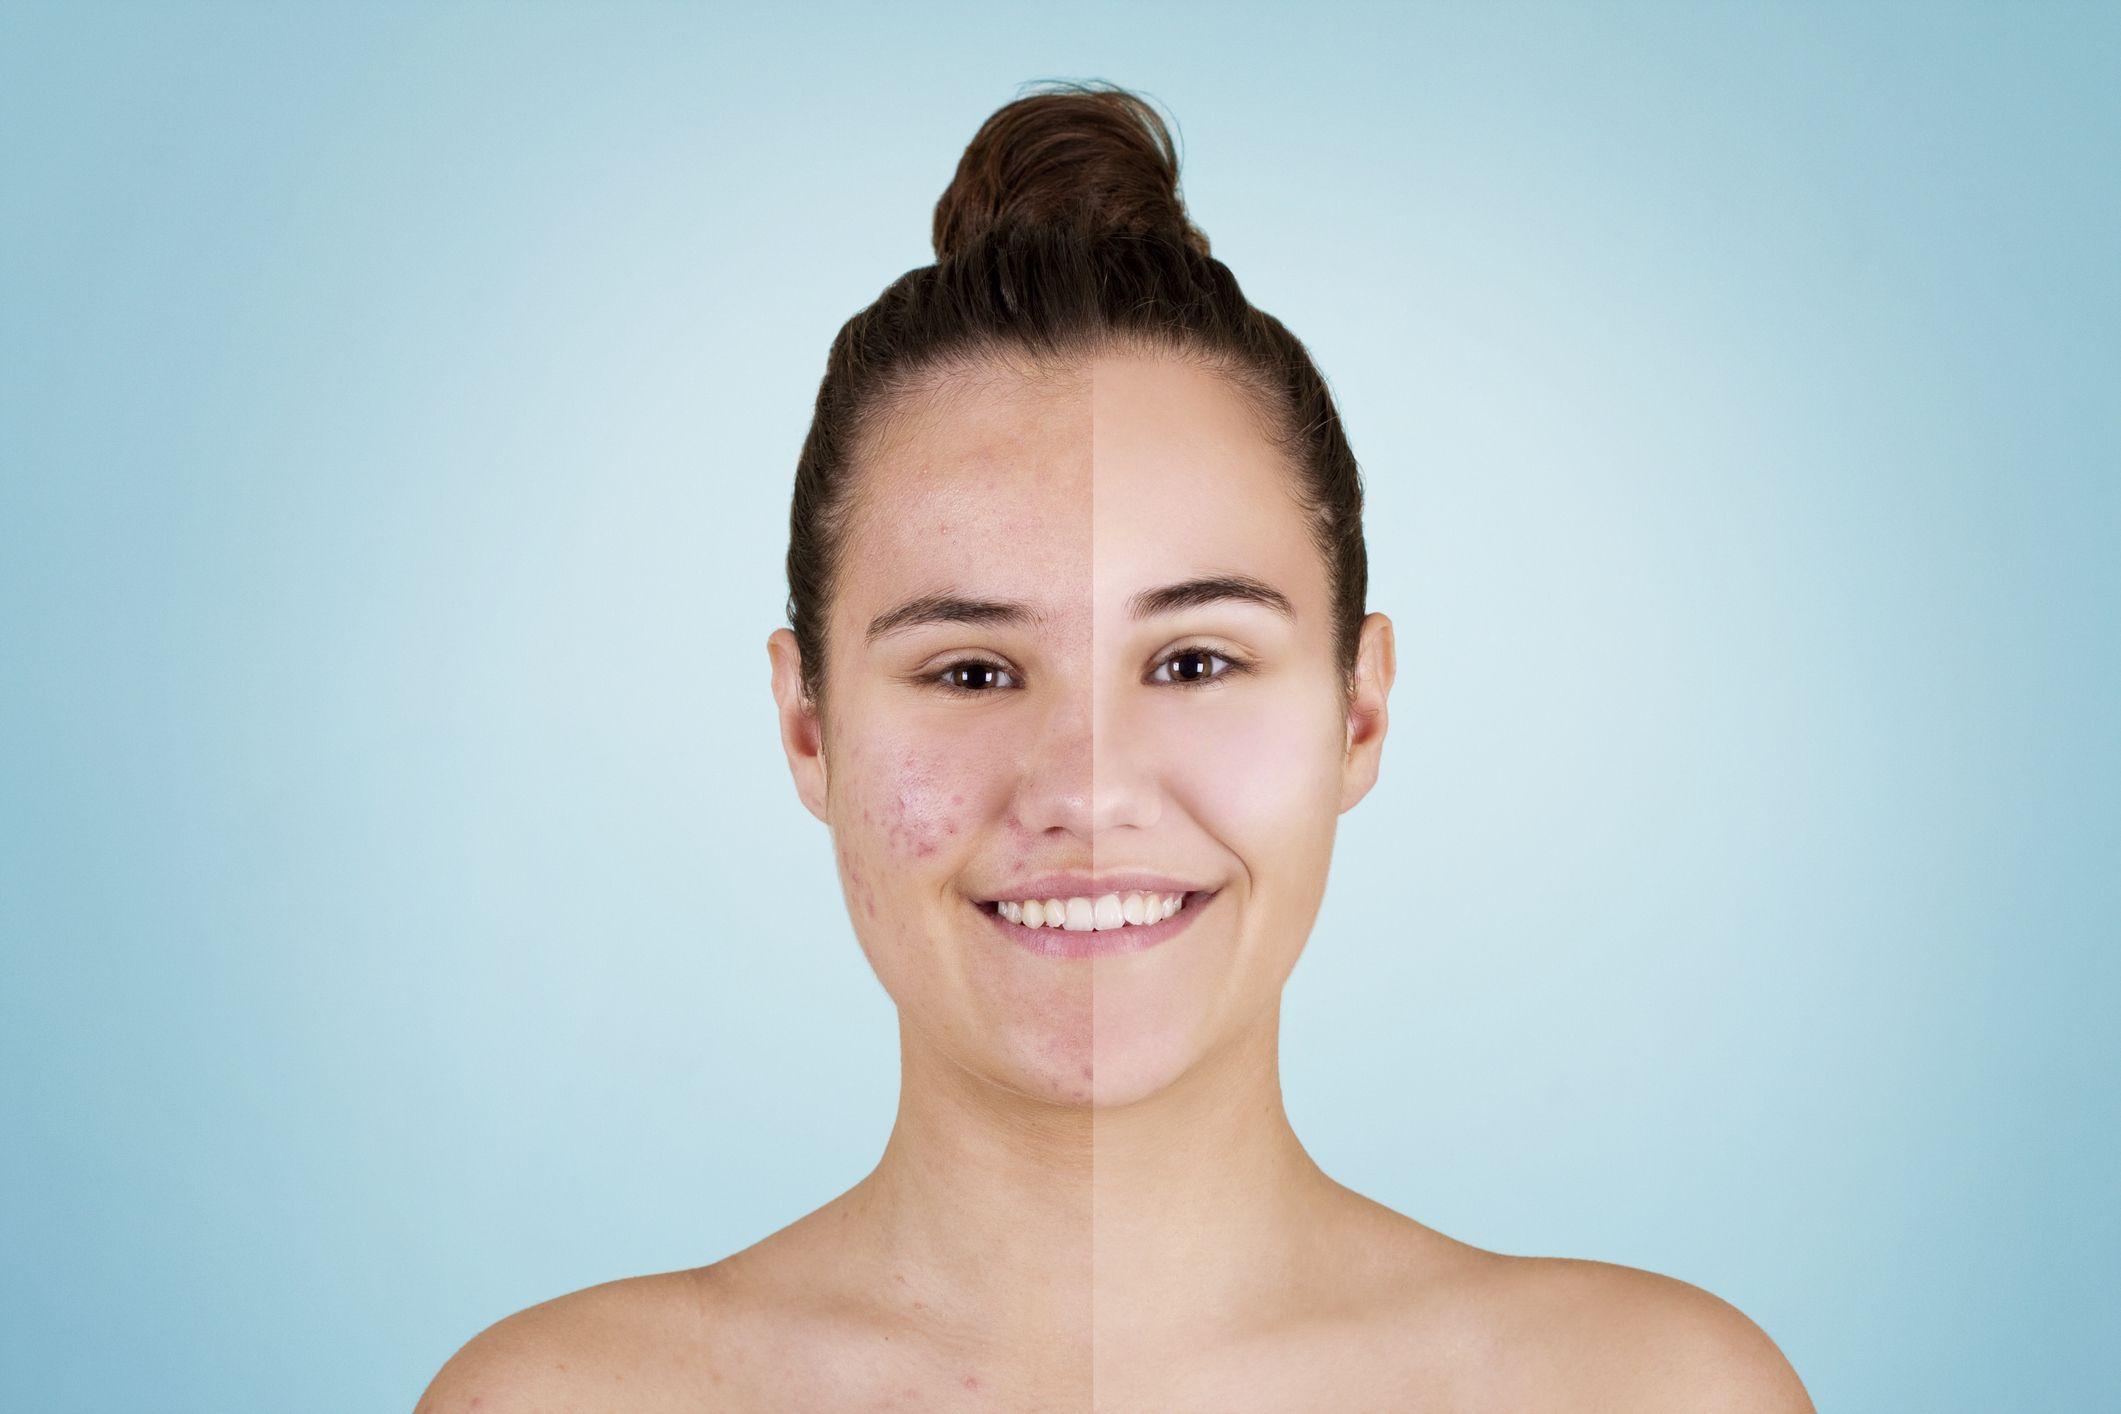 Facial rash after using acne medicine